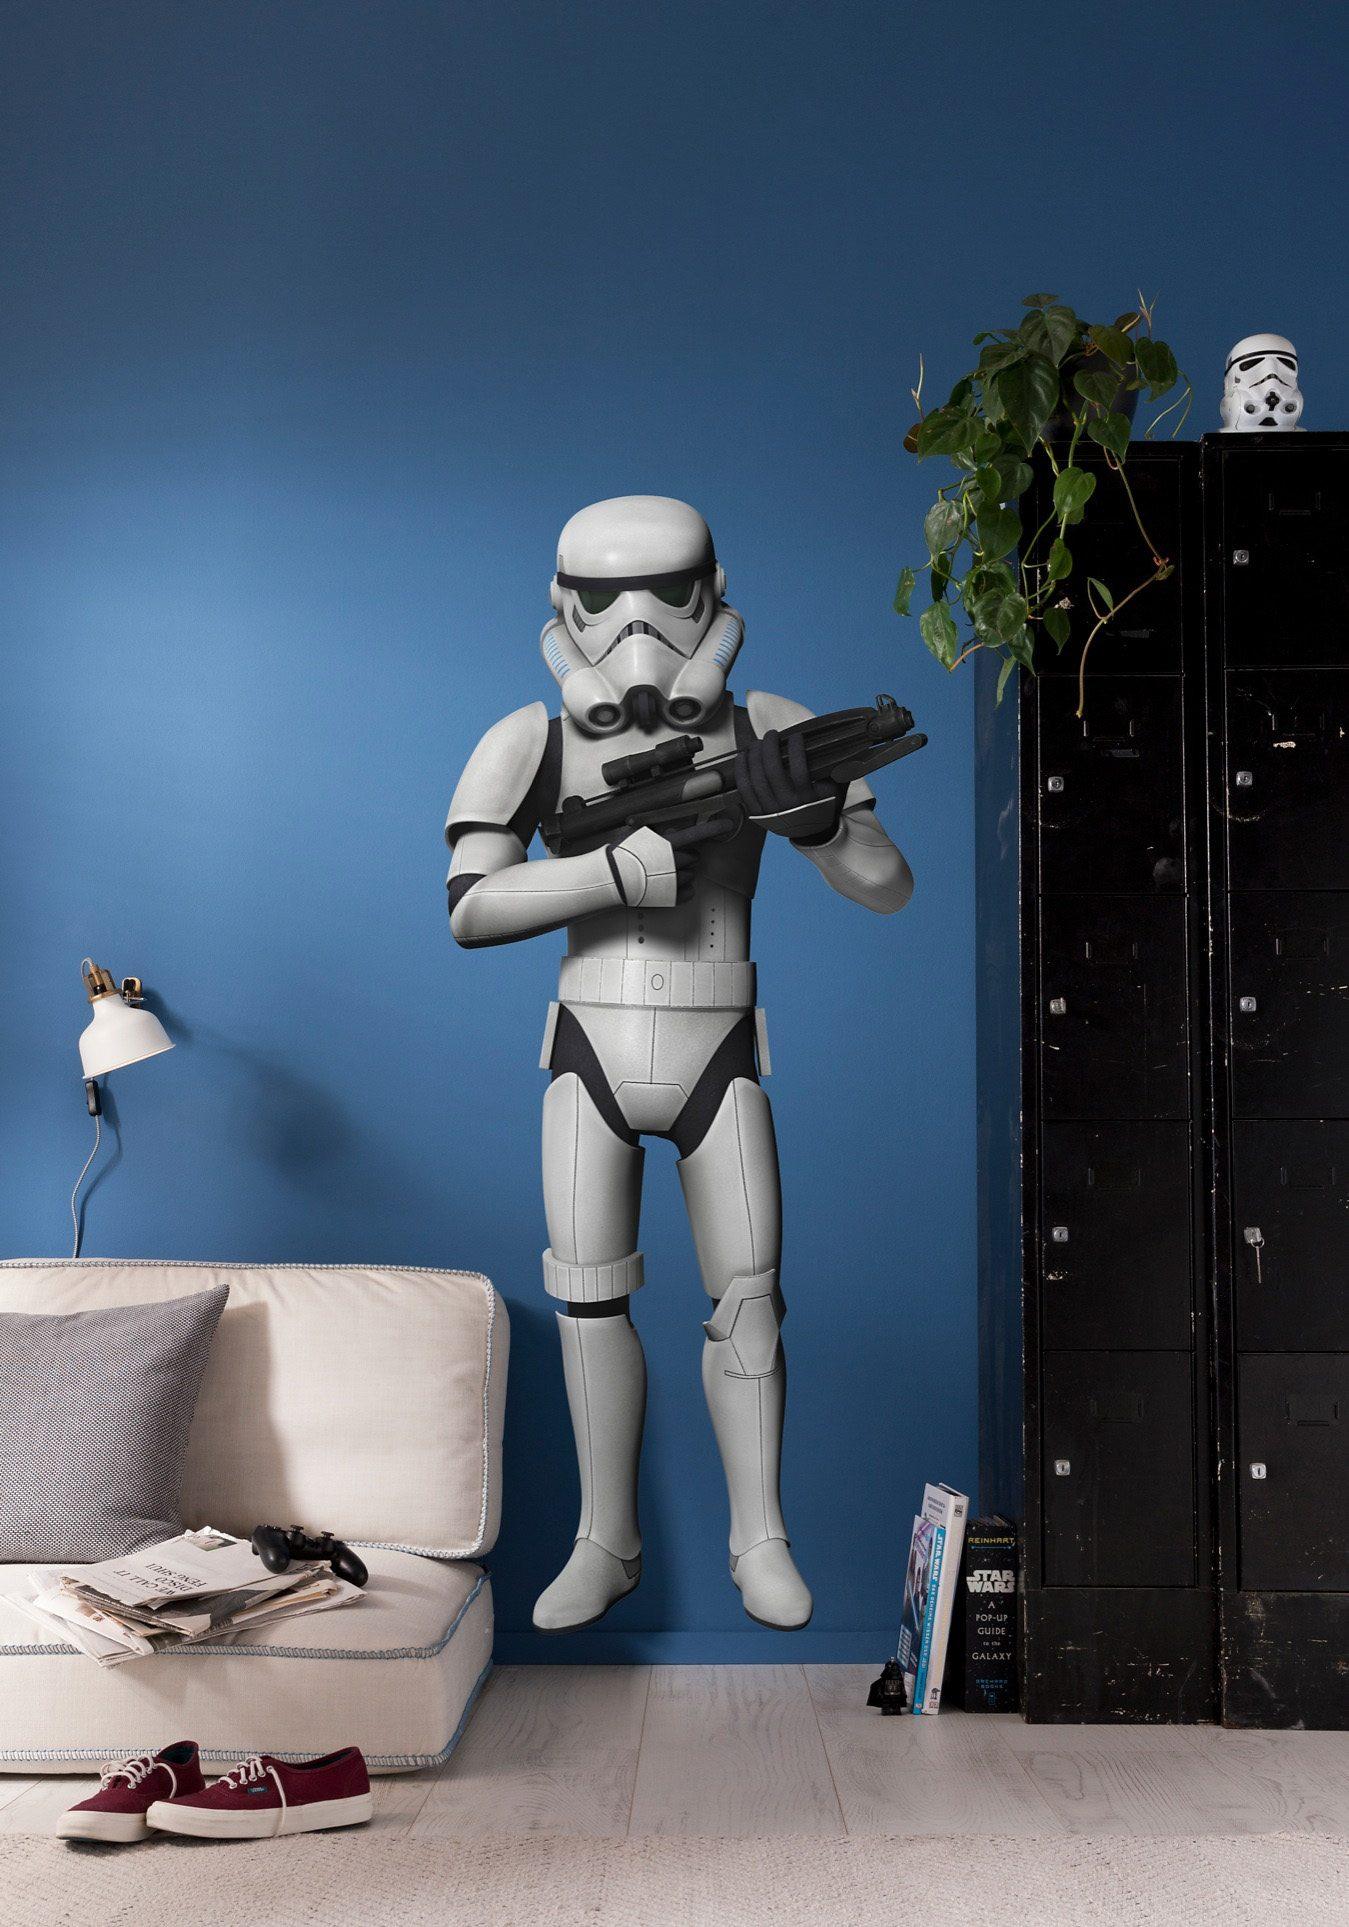 Wandsticker, Komar, »Star Wars Stormtrooper«, 70/100 cm